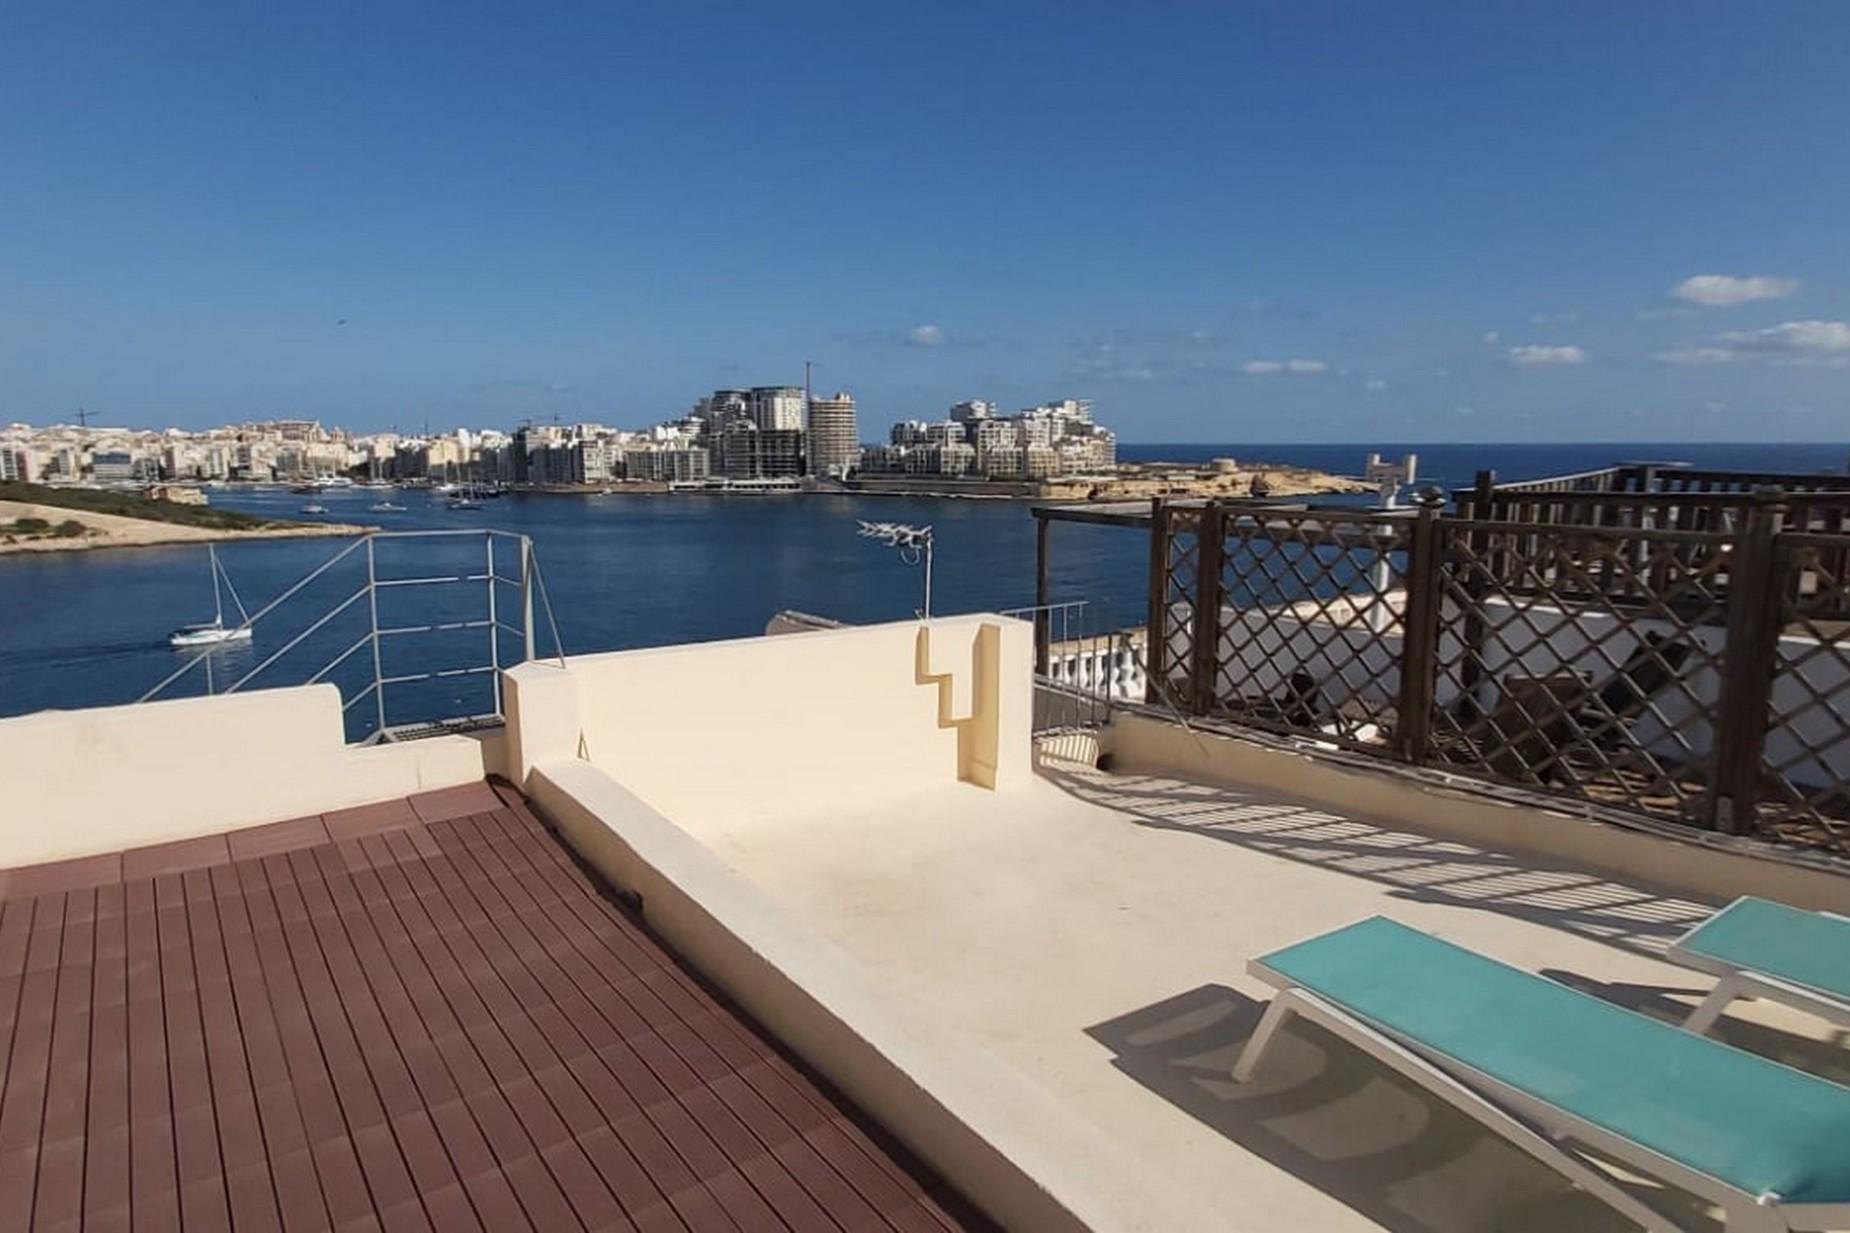 4 bed  For Sale in Valletta, Valletta - thumb 2